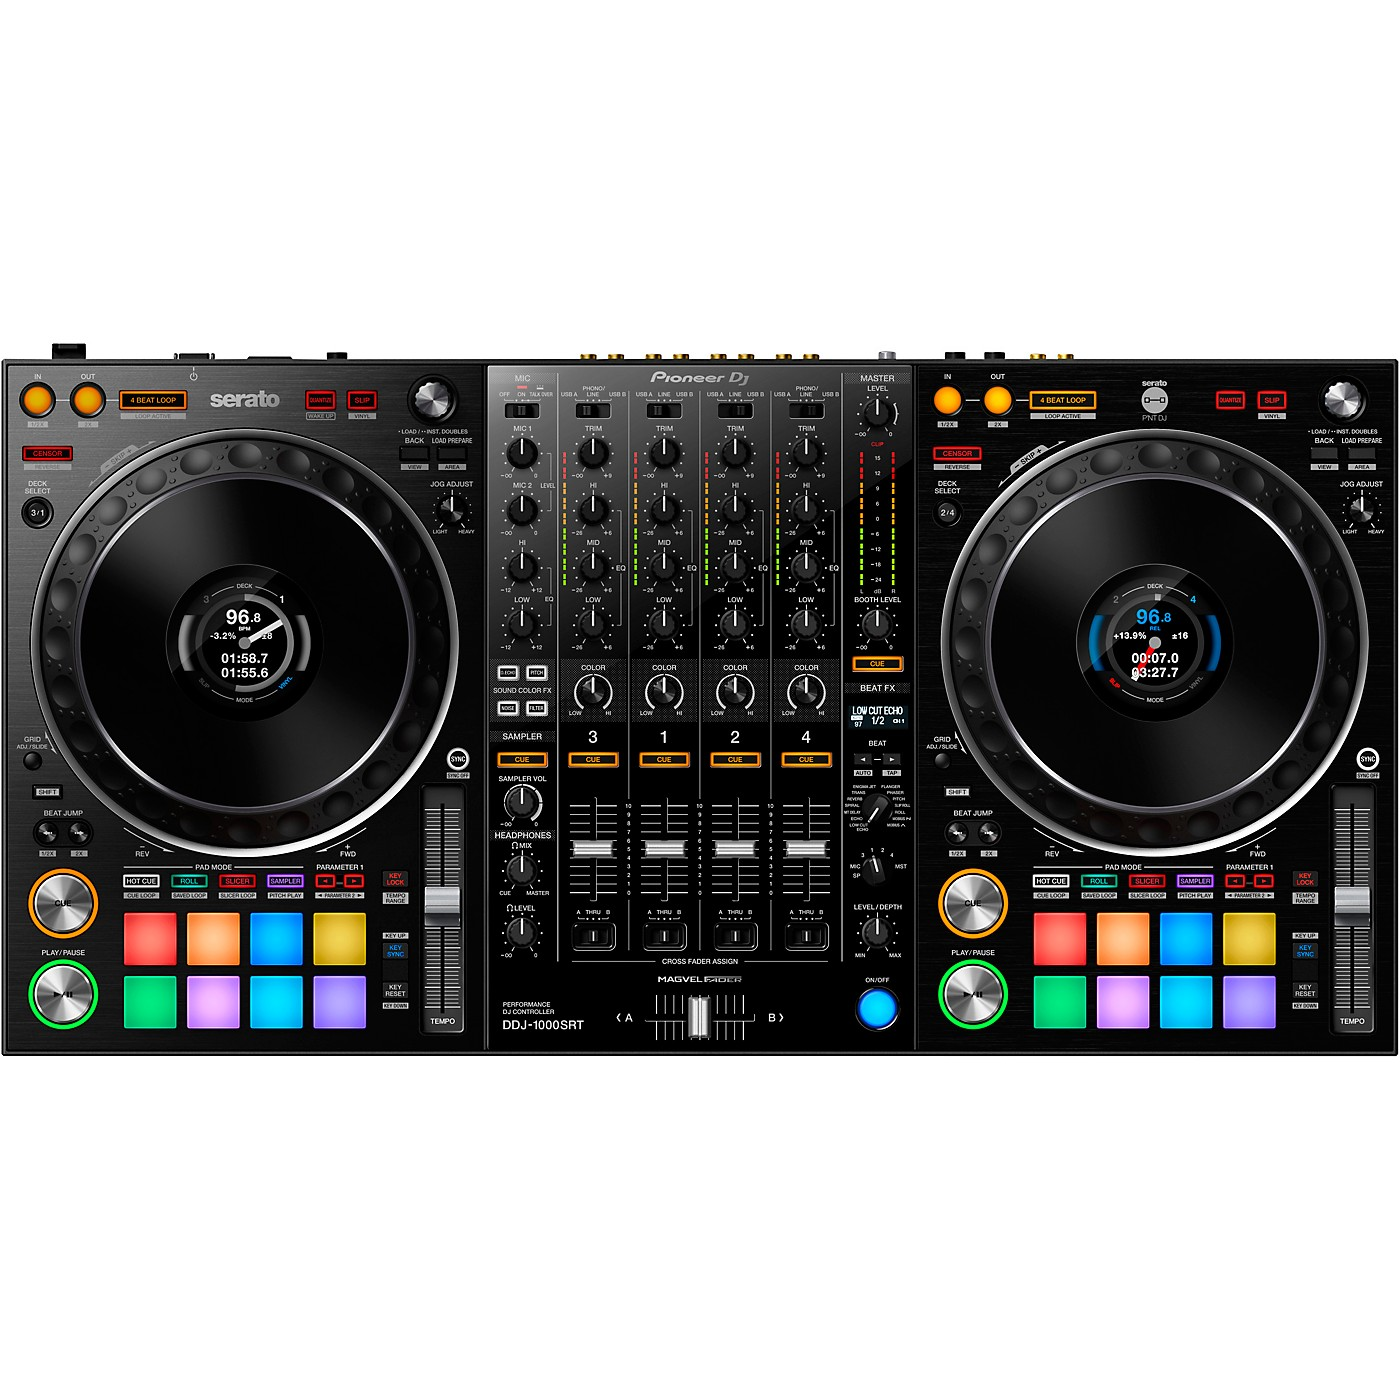 Pioneer DDJ-1000SRT Controller for Serato DJ Pro thumbnail